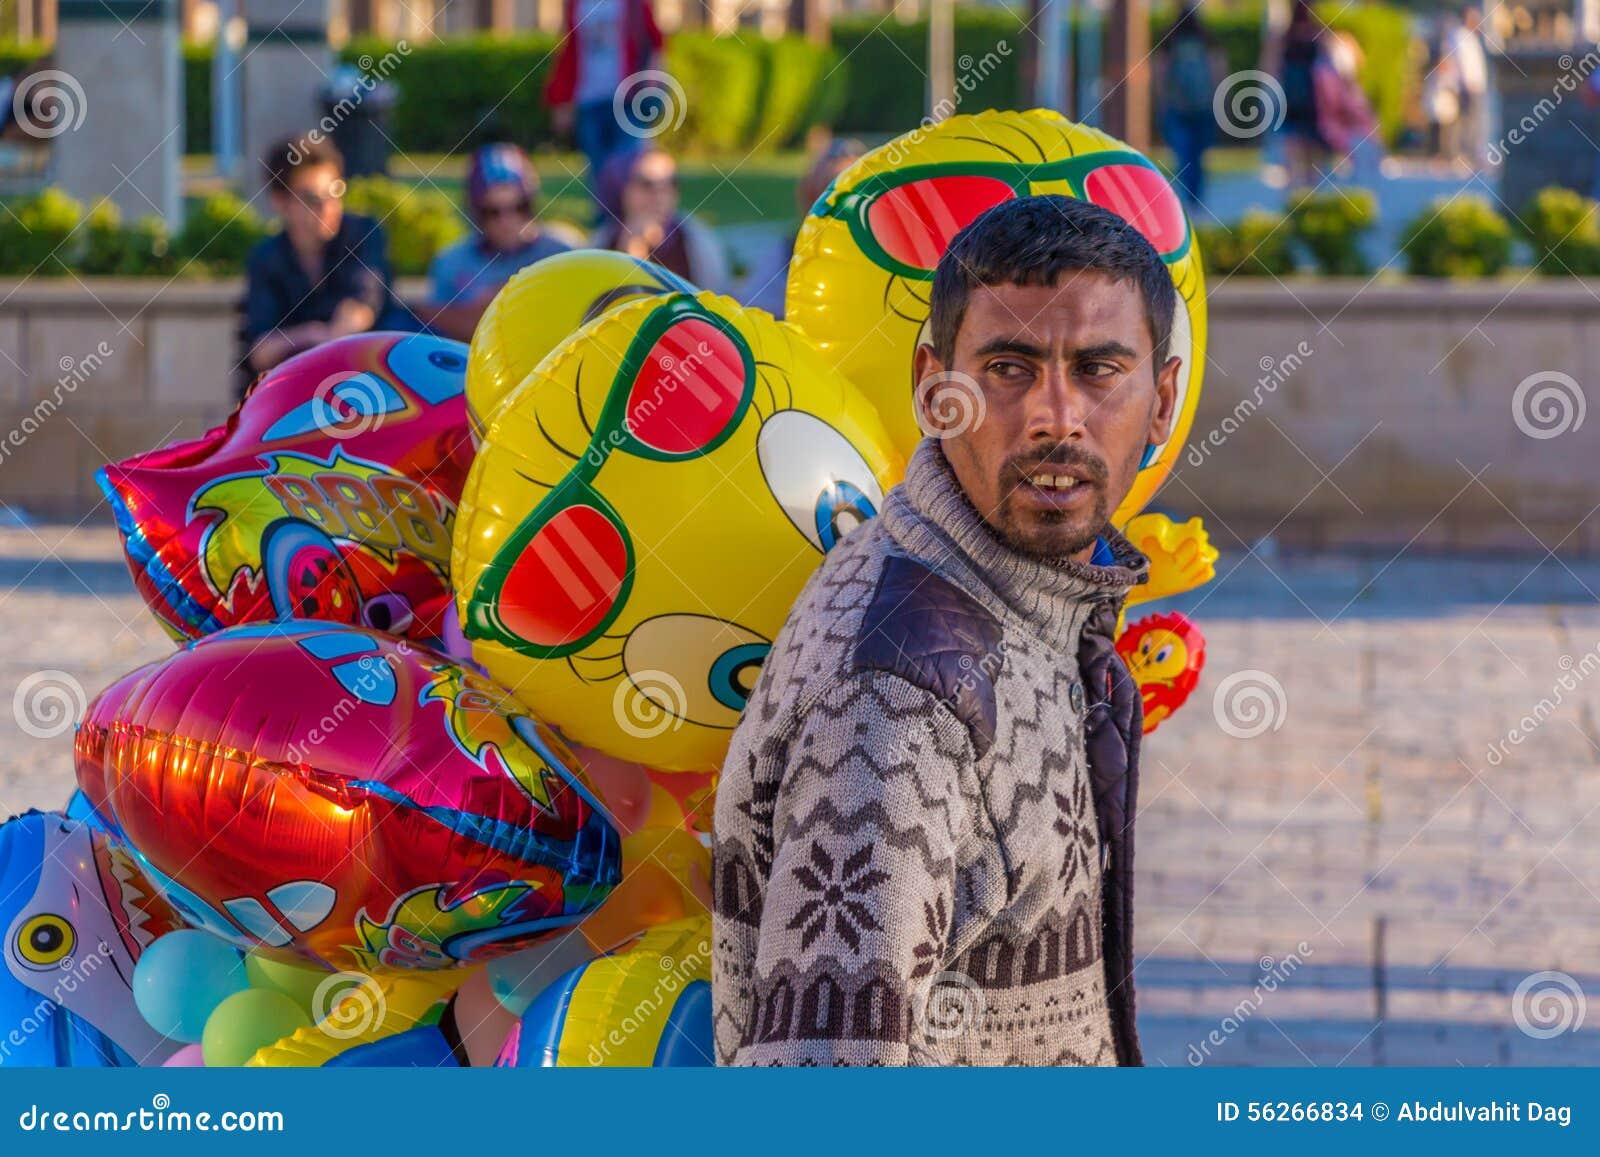 Street vendors selling balloons